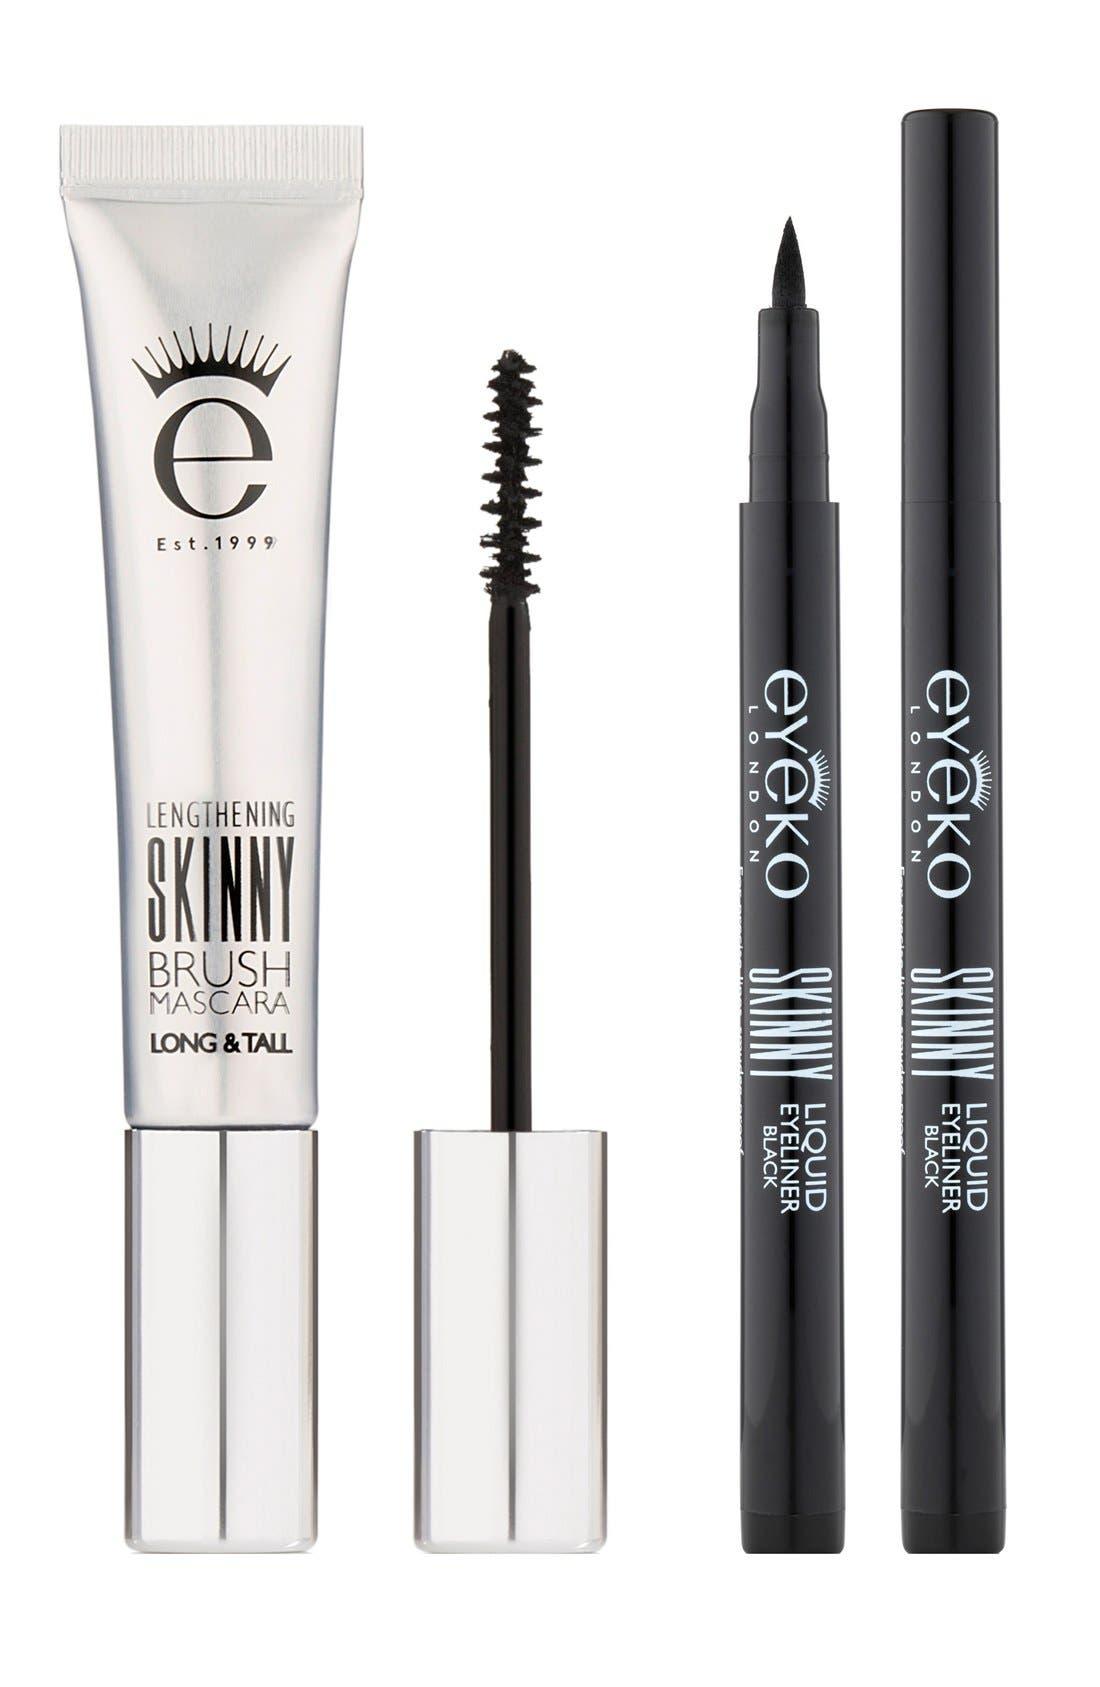 Eyeko 'Skinny' Mascara & Eyeliner Duo